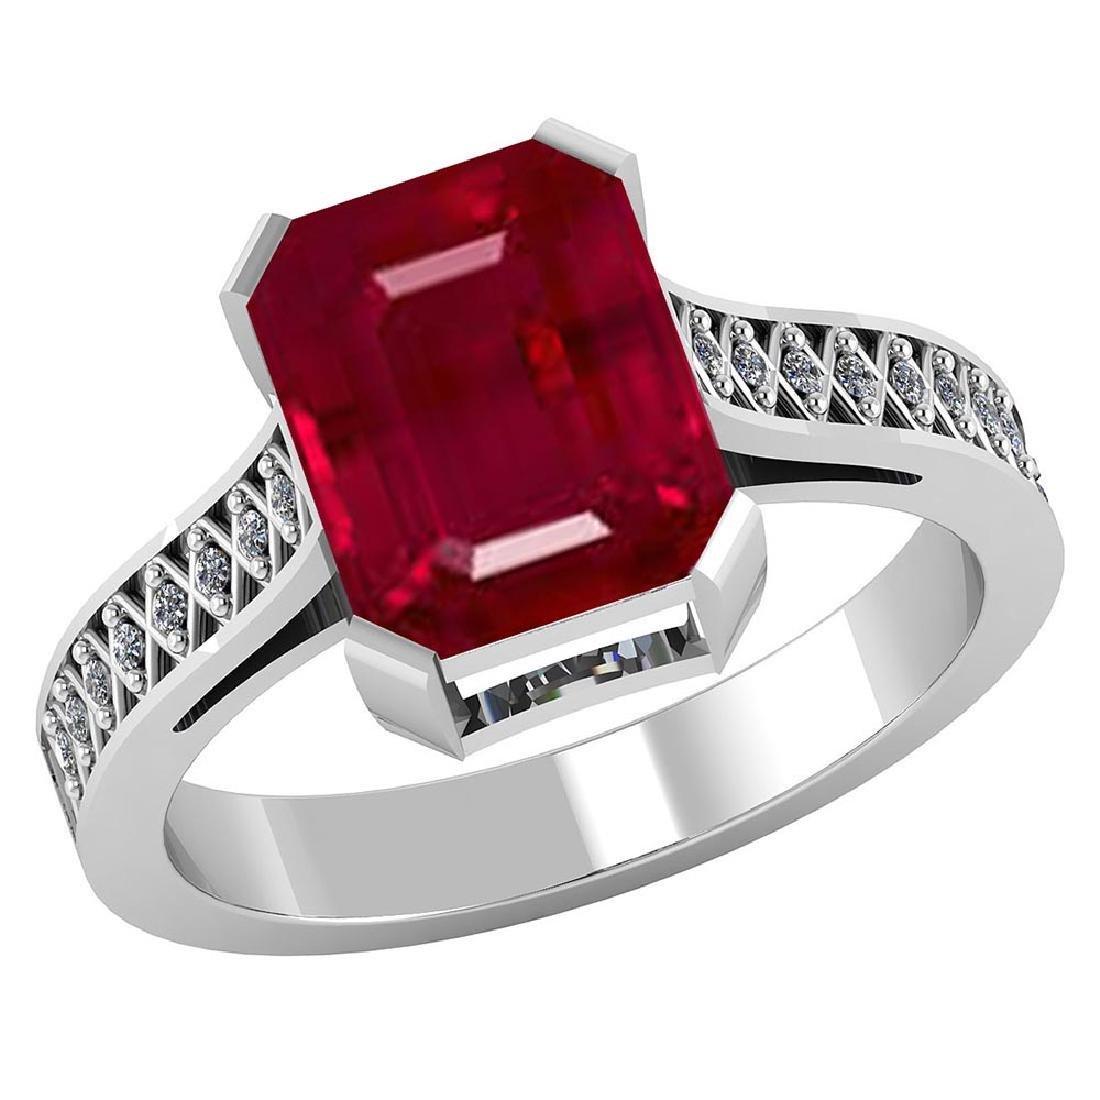 Certified 2.90 CTW Genuine Ruby And Diamond 14K White G